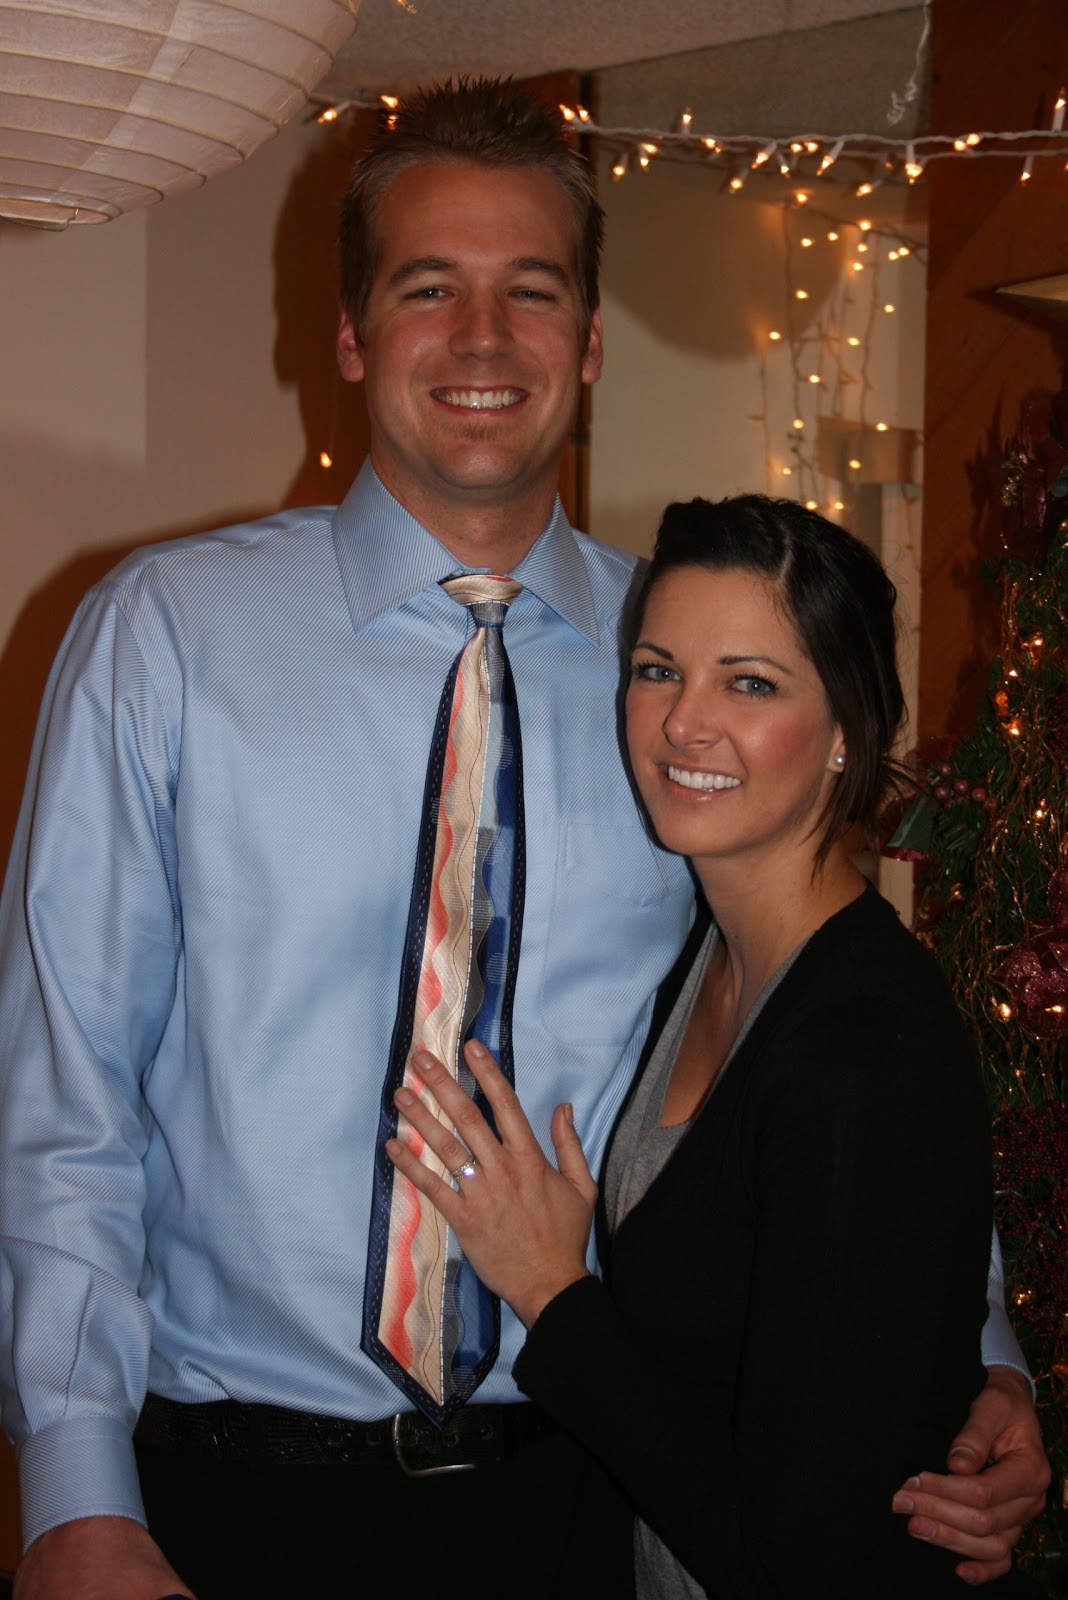 The mormon bachelor